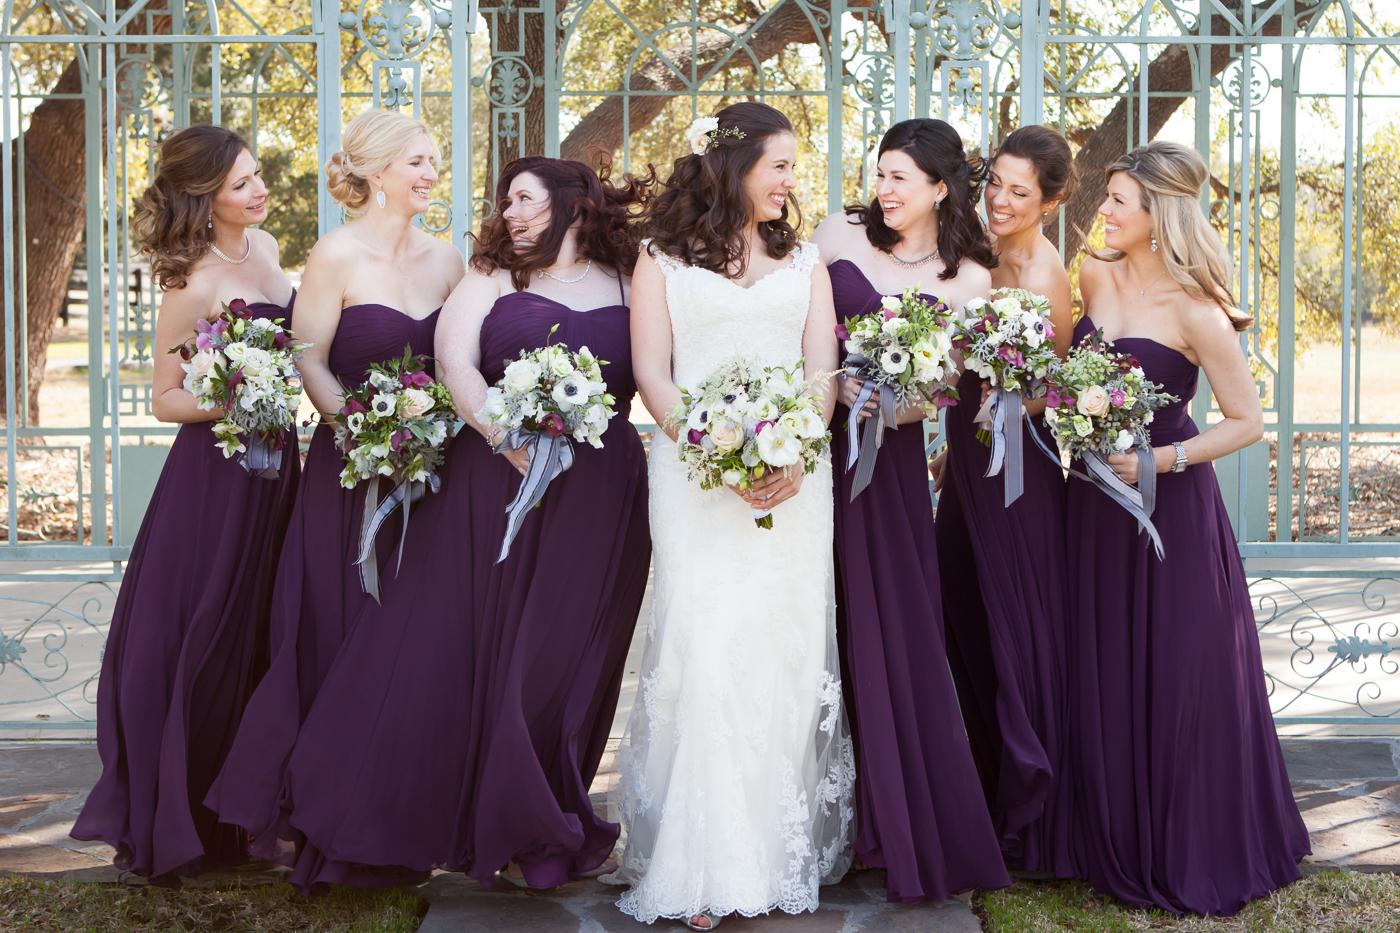 Austin-wedding-photography-001.jpg